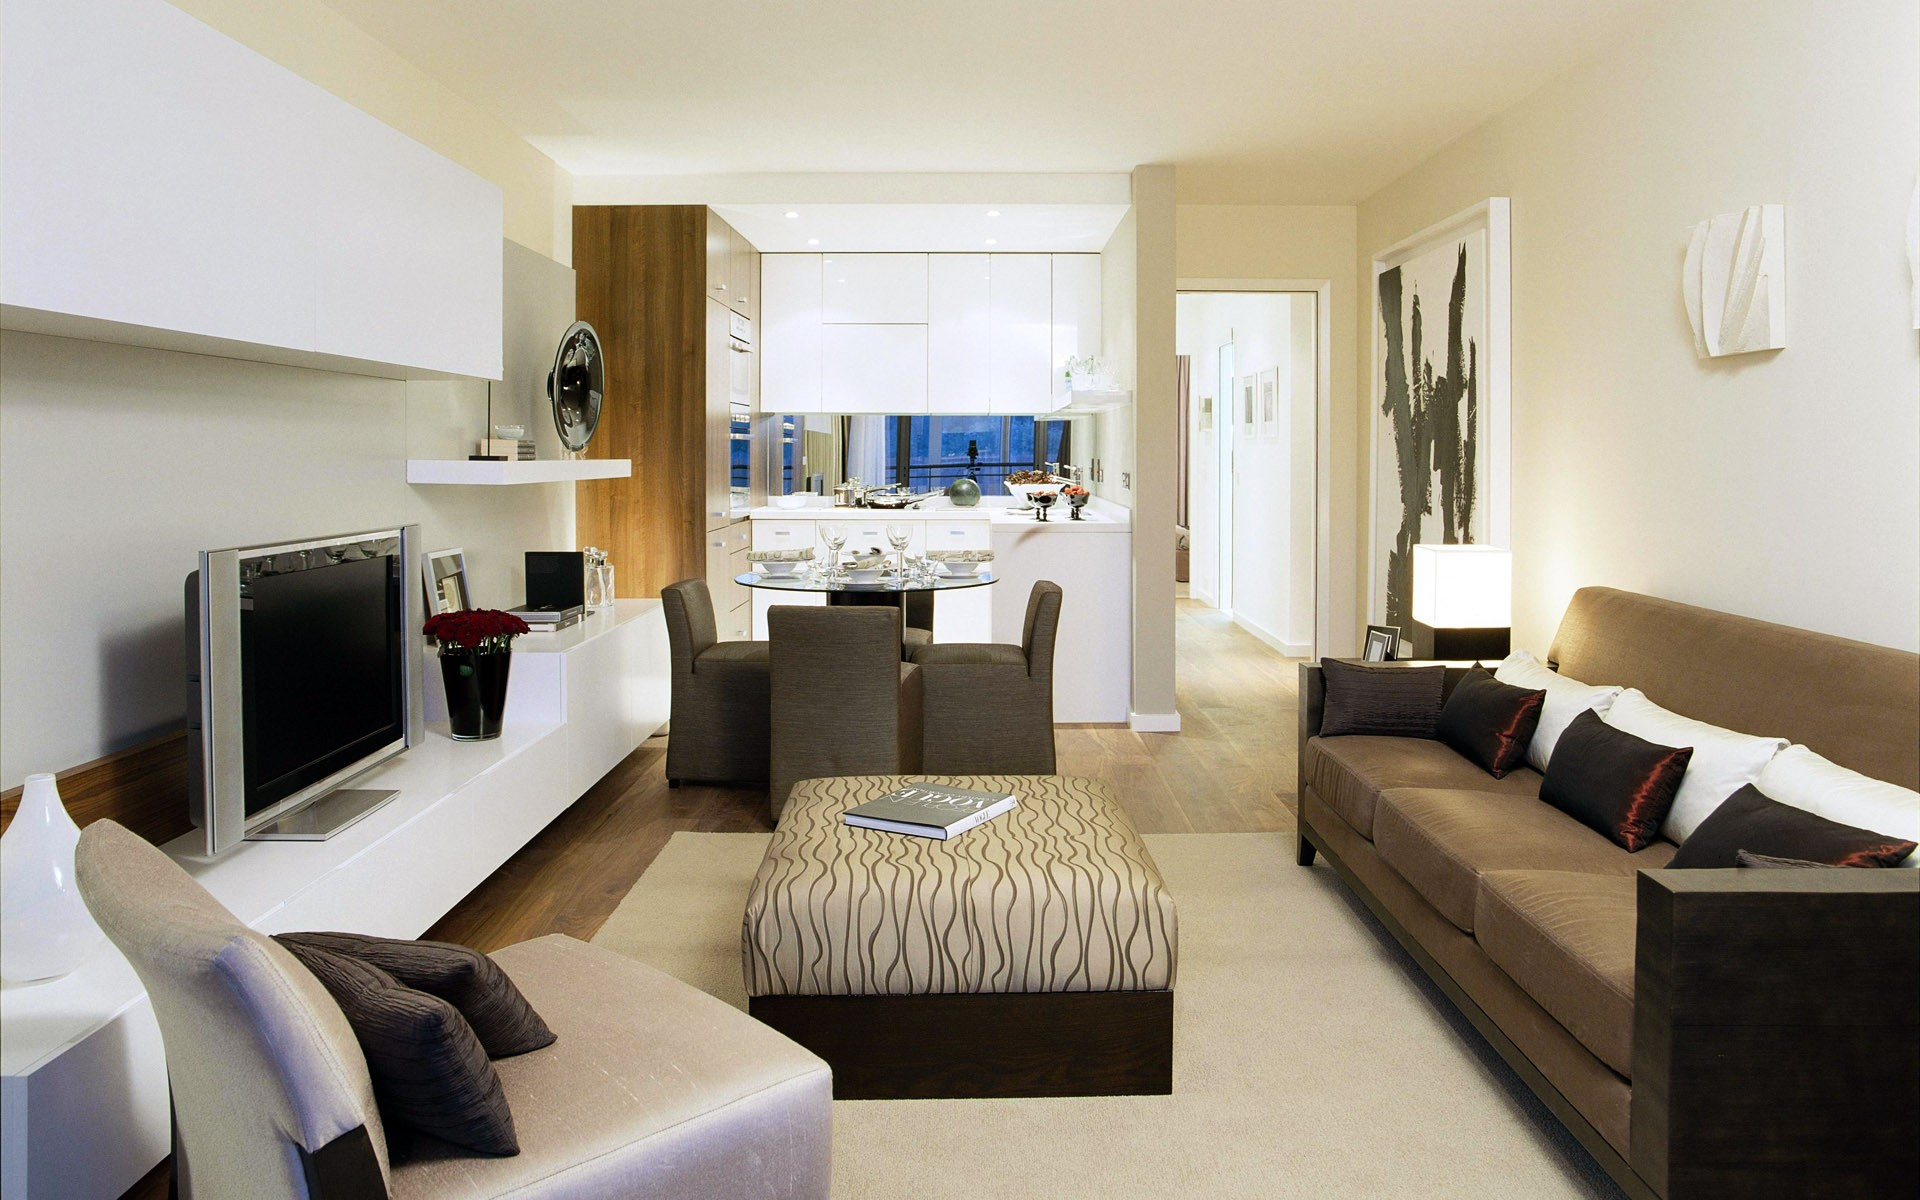 Dise o de sala de espera hd 1920x1200 imagenes for Diseno de interiores sala de estar